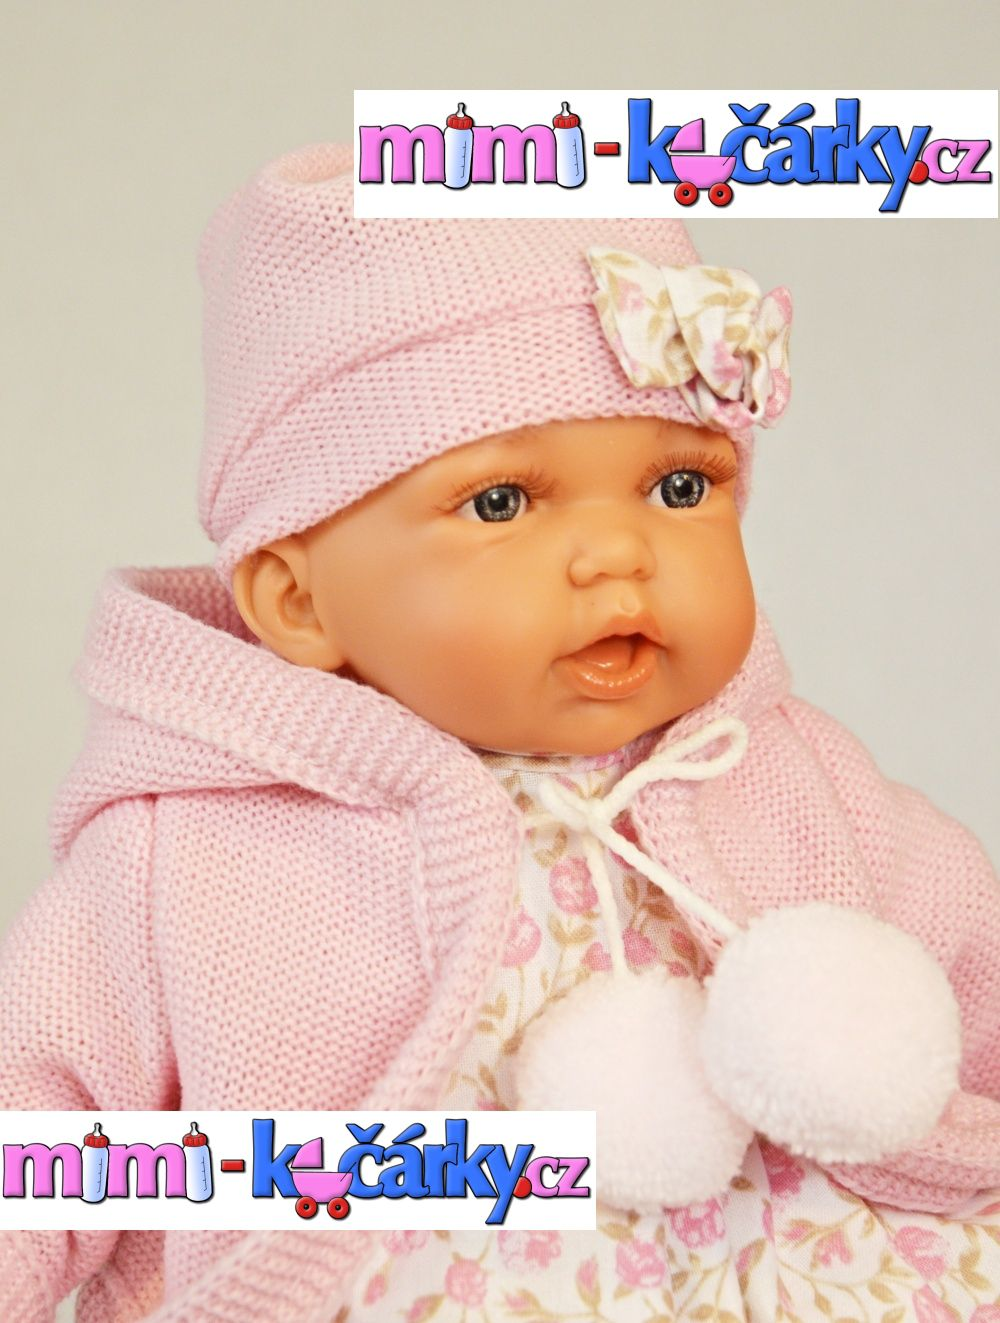 Mluvící panenka Antonio Juan Petty 27 cm holčička v růžové svetříku